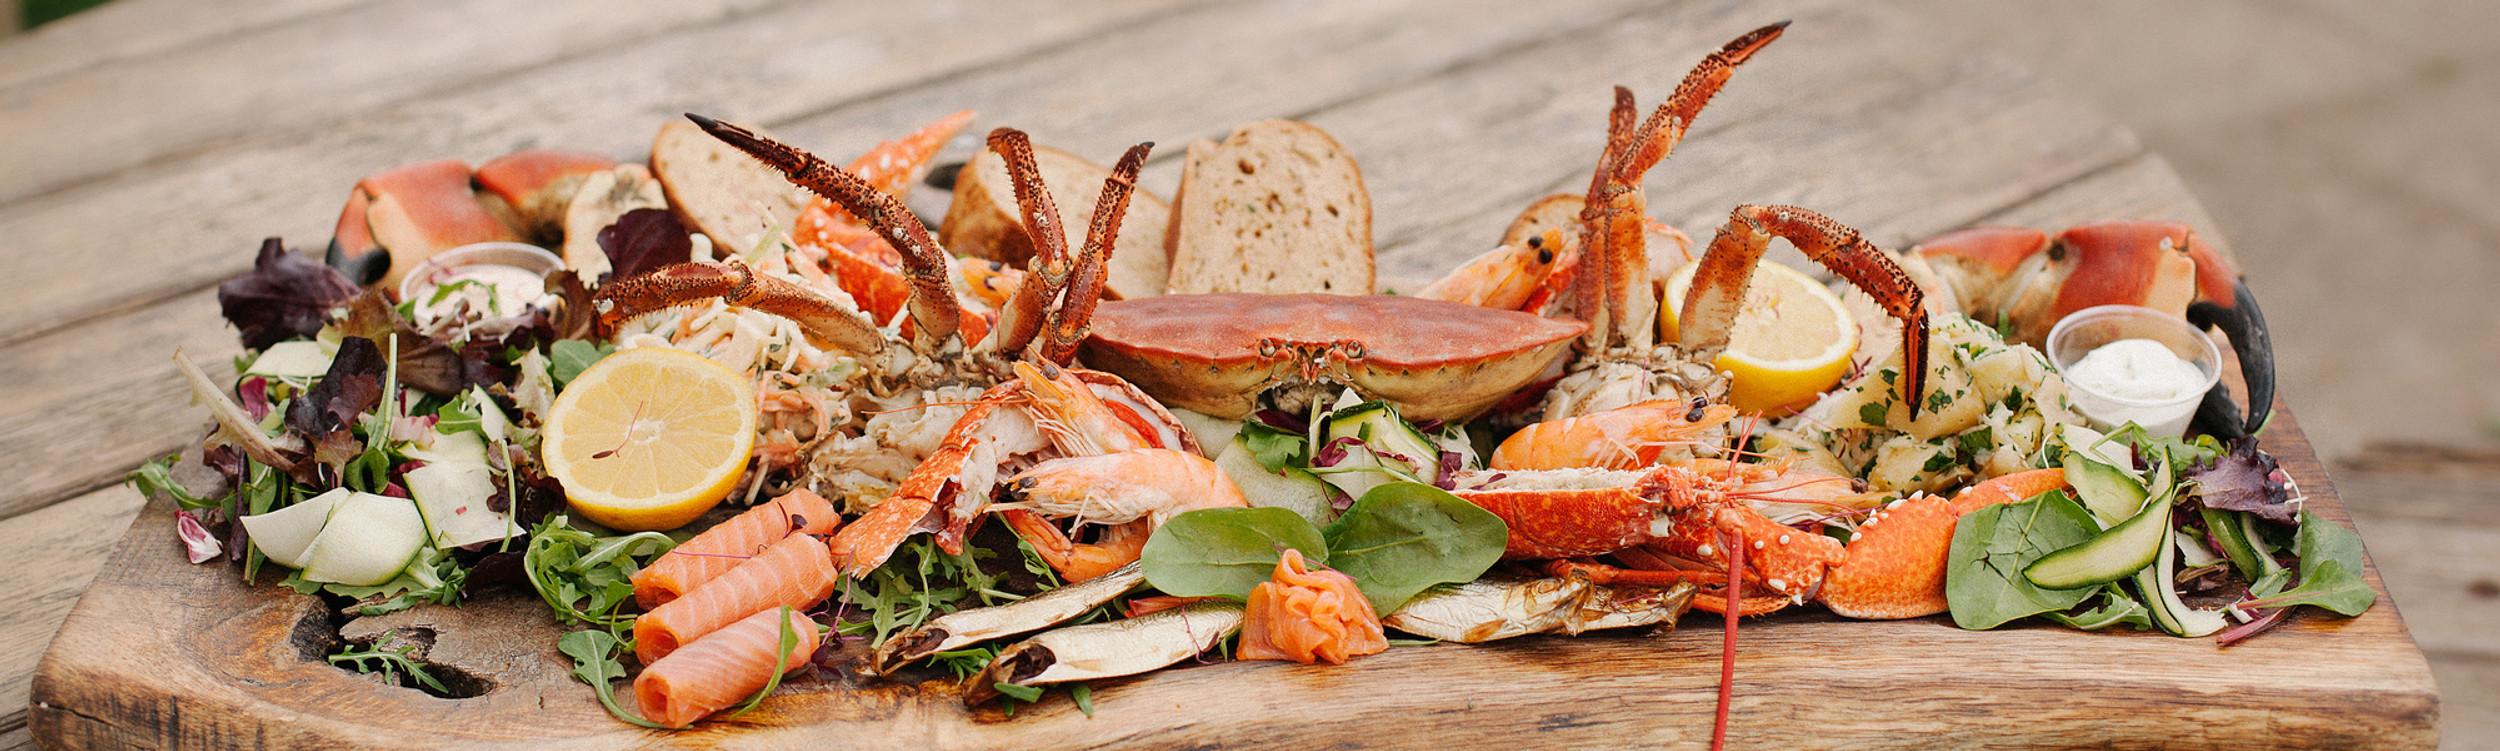 seafoodsharing-high-res.jpg